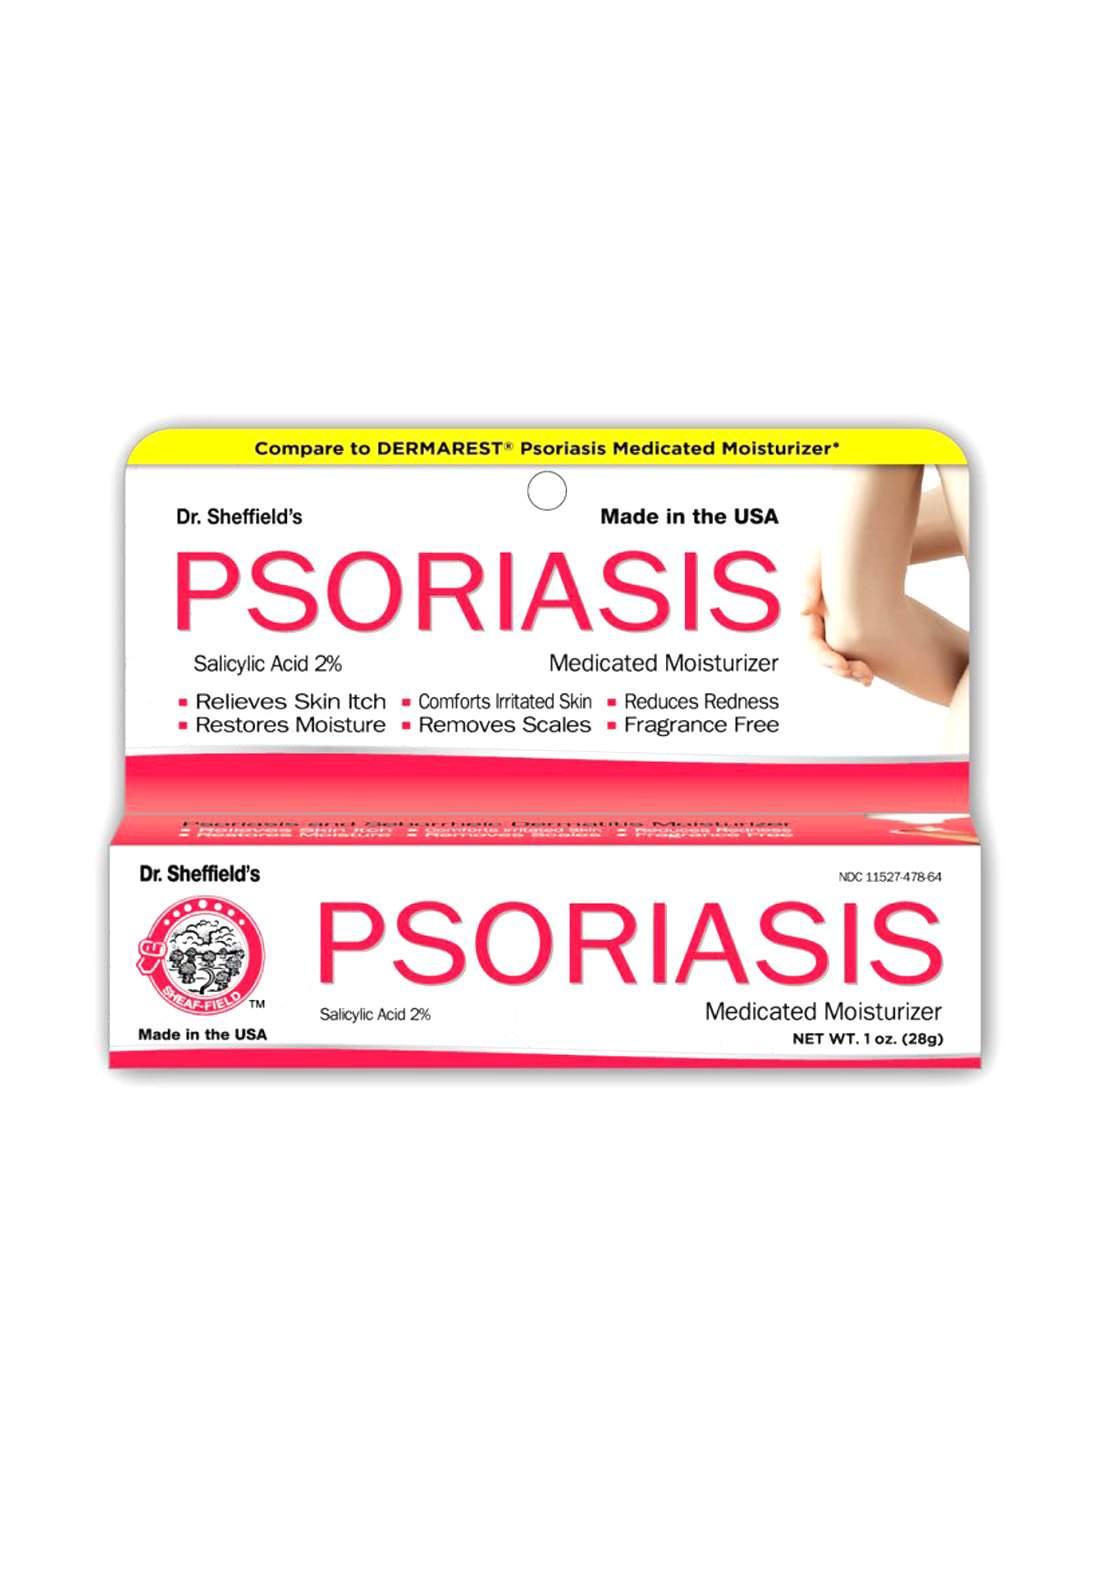 Dr. Sheffield's Psoriasis 2% Salicyclic Acid Medicated Moisturizer 28g مرطب طبي لصدفية الجلد